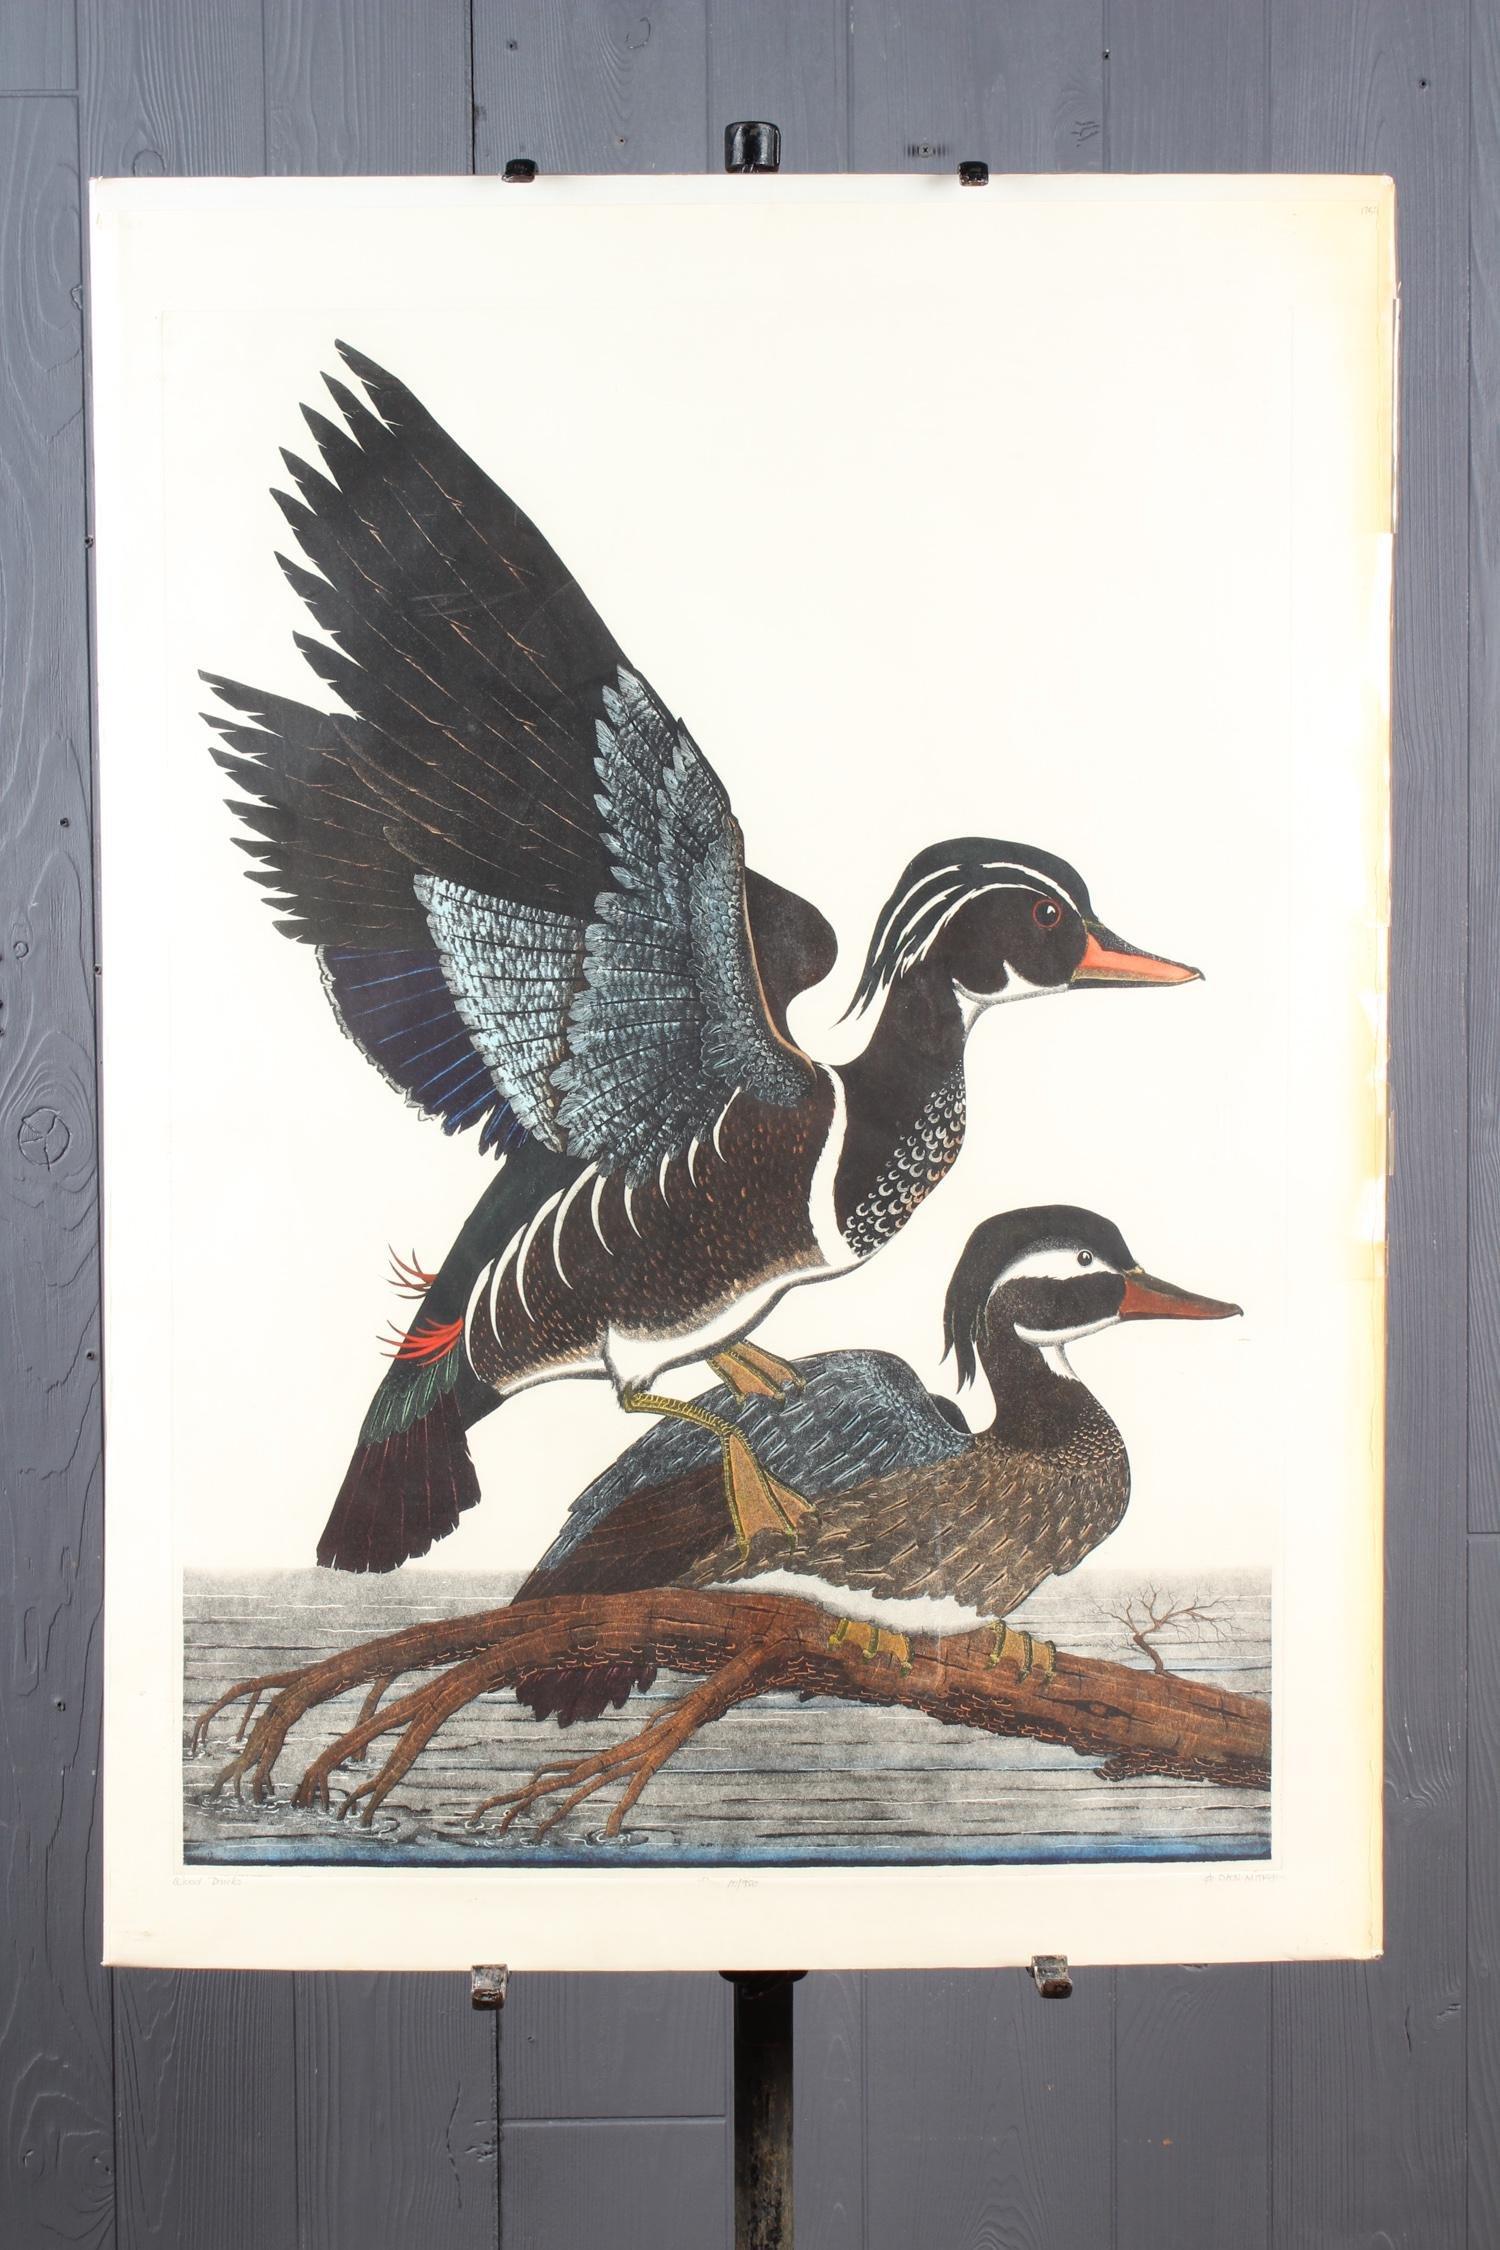 Wood Ducks by Dan Mitra